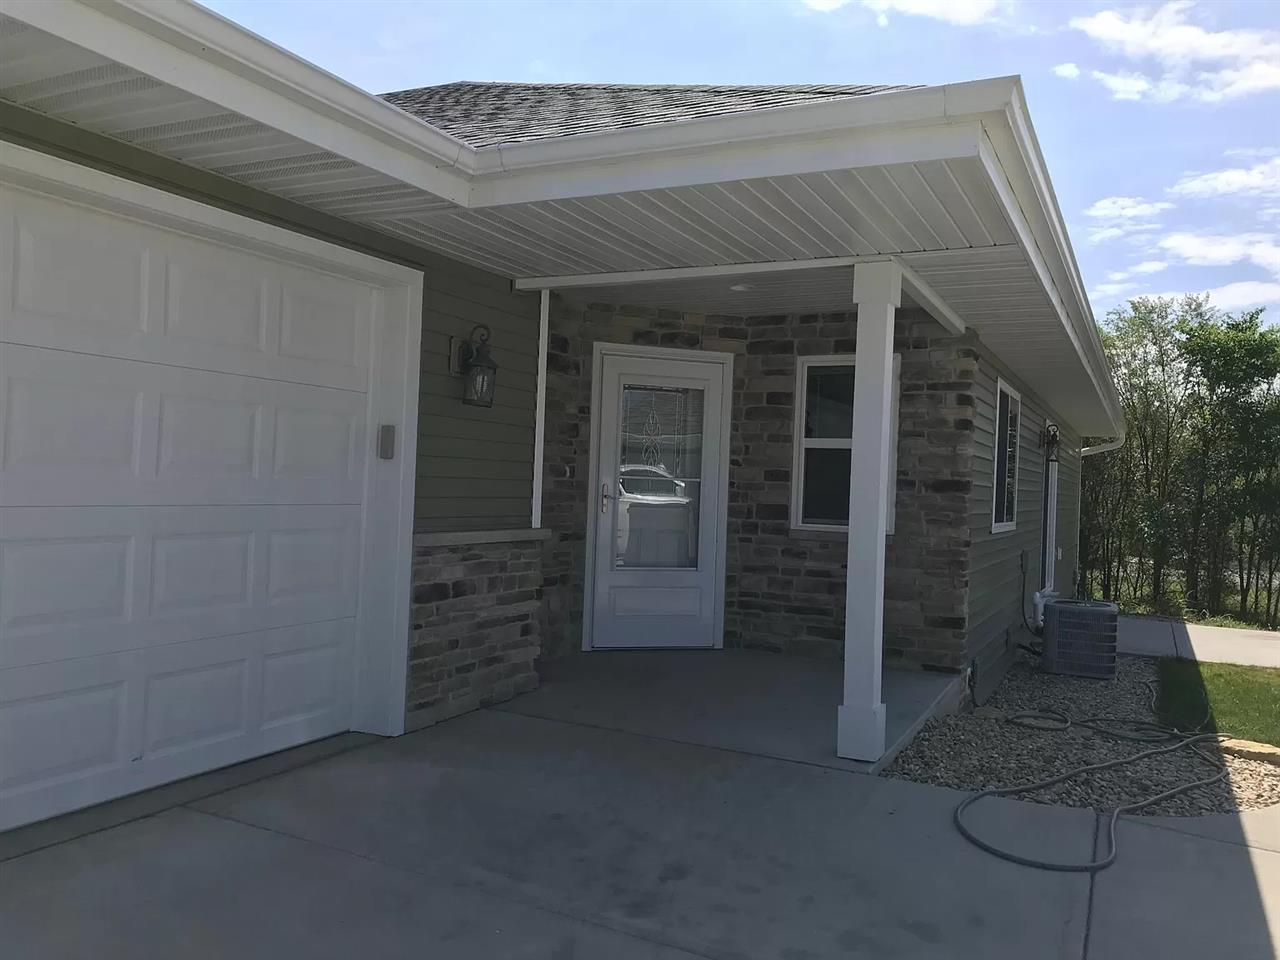 826 Oregon Parks Ave, Oregon, Wisconsin 53575, 3 Bedrooms Bedrooms, ,Rental,For Rent,Oregon Parks Ave,1899423